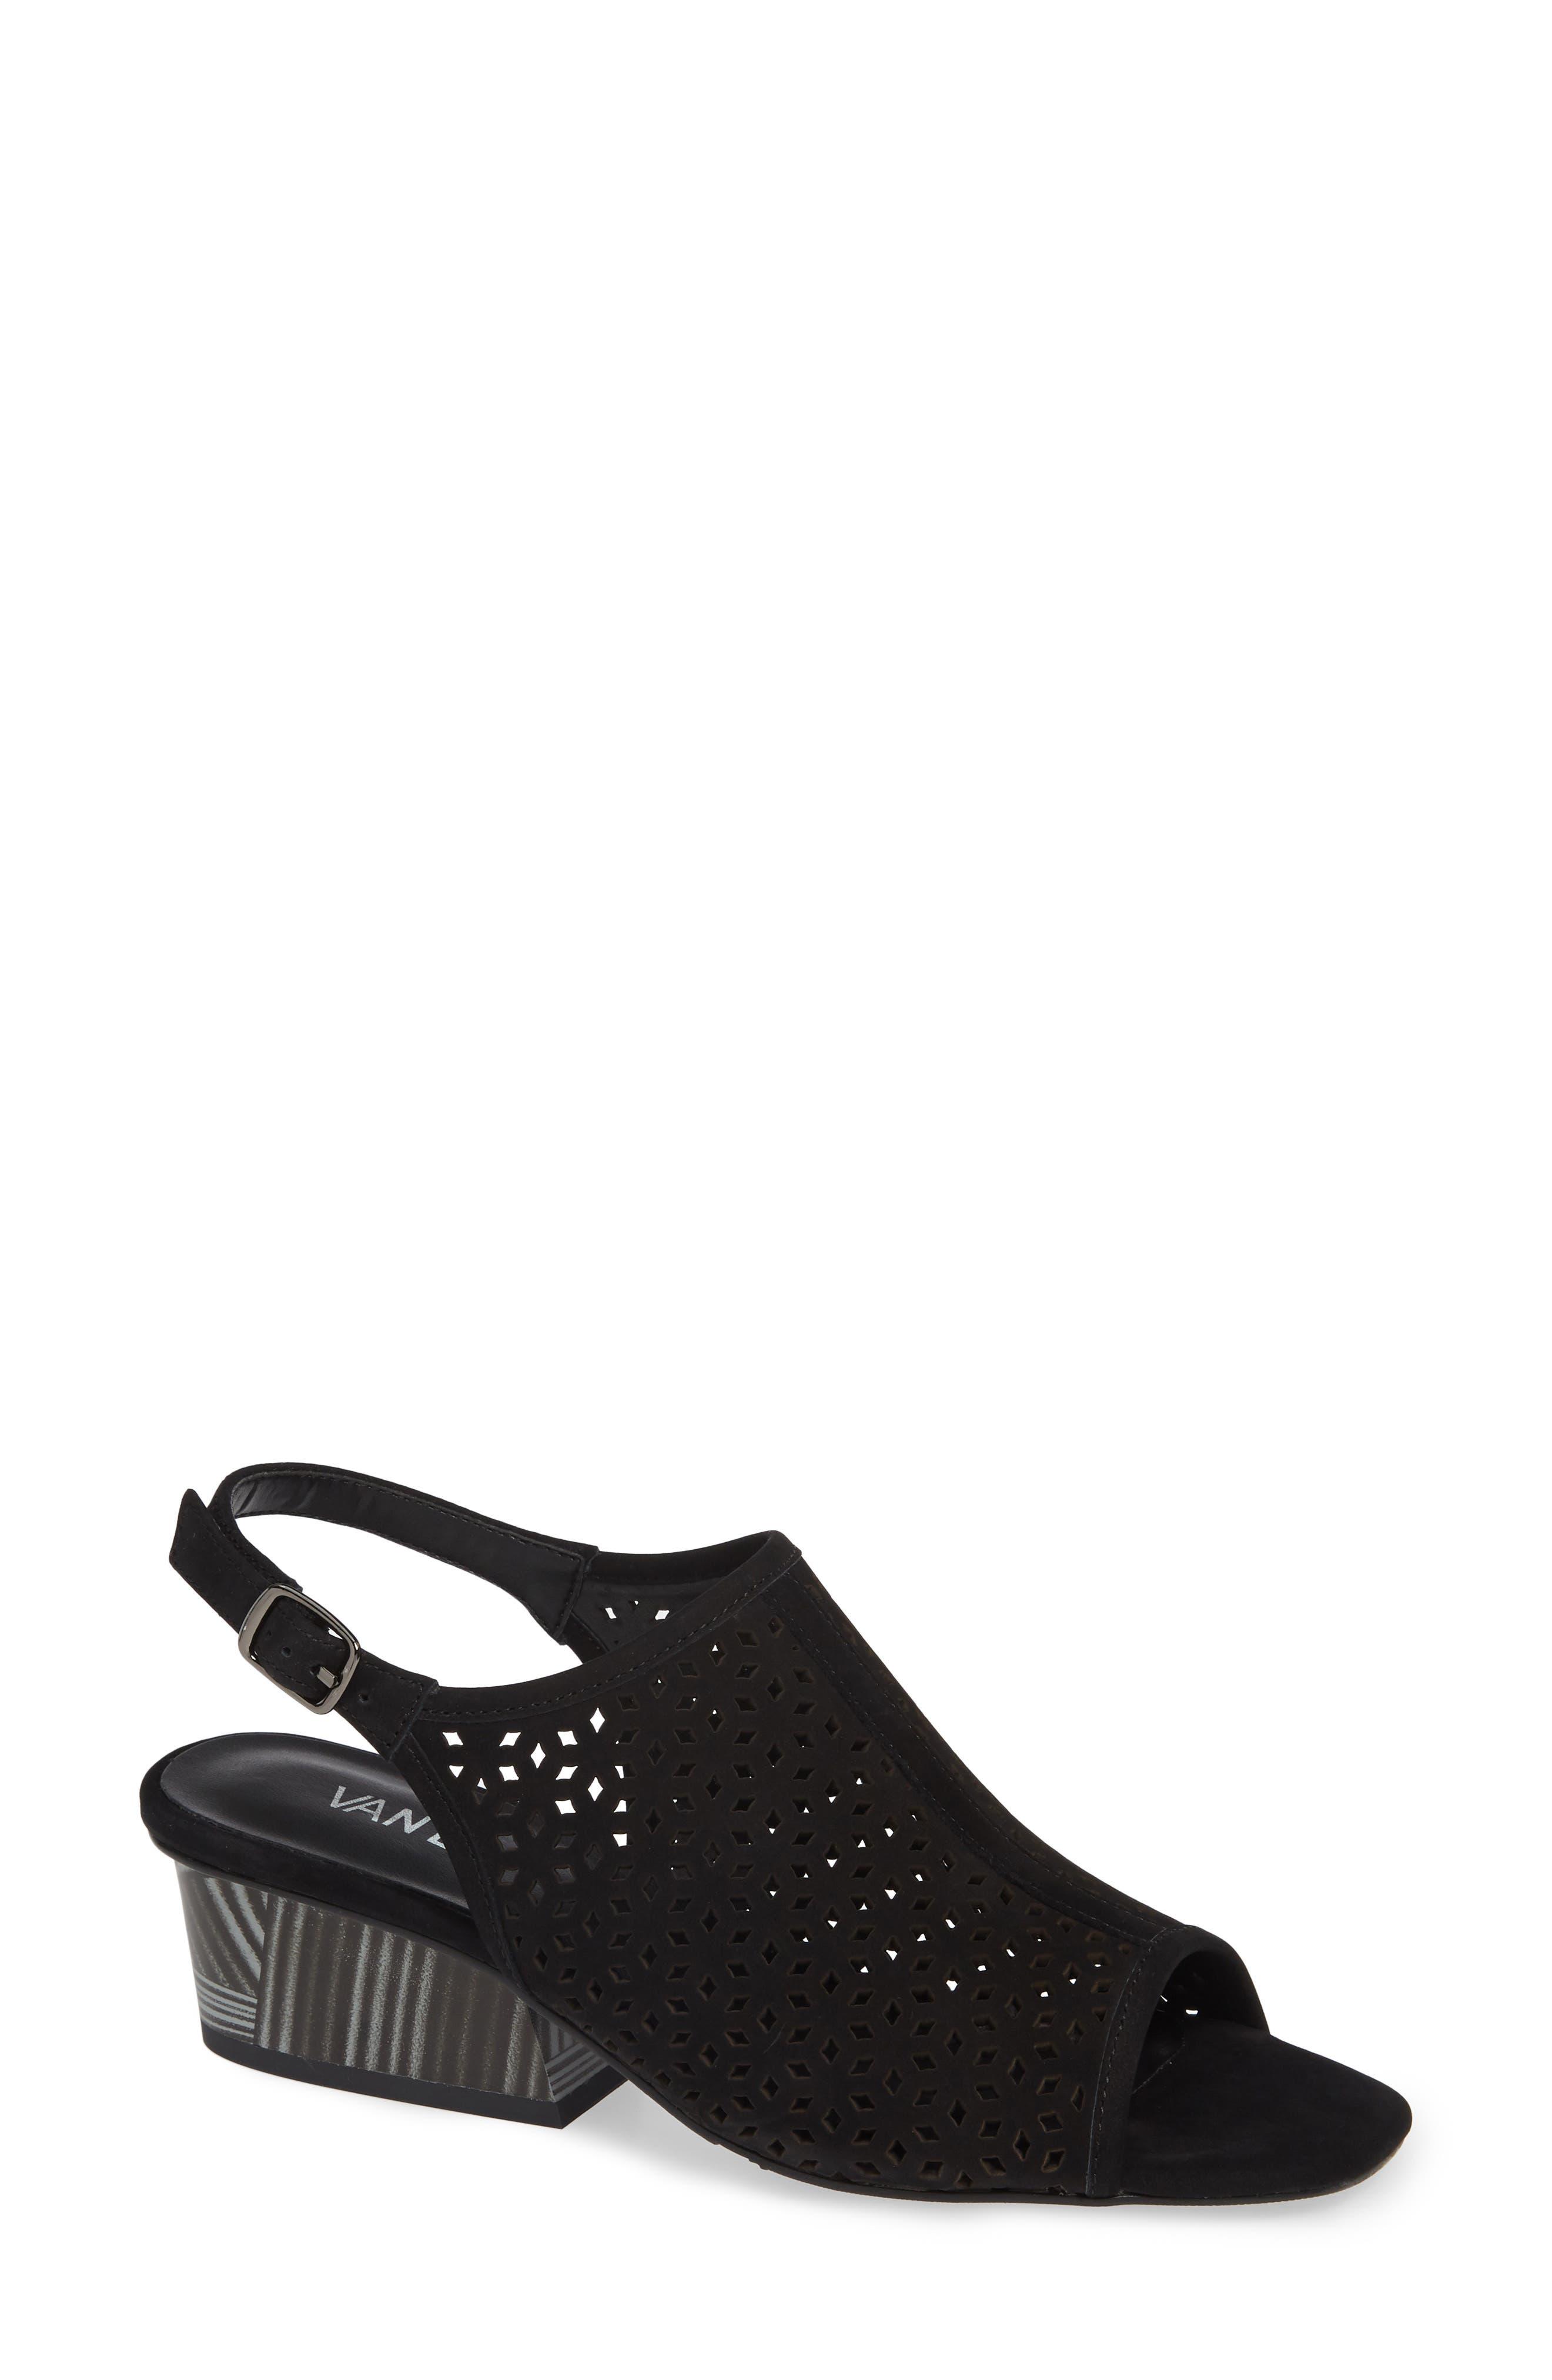 Candra Perforated Sandal,                             Main thumbnail 1, color,                             BLACK NUBUCK LEATHER